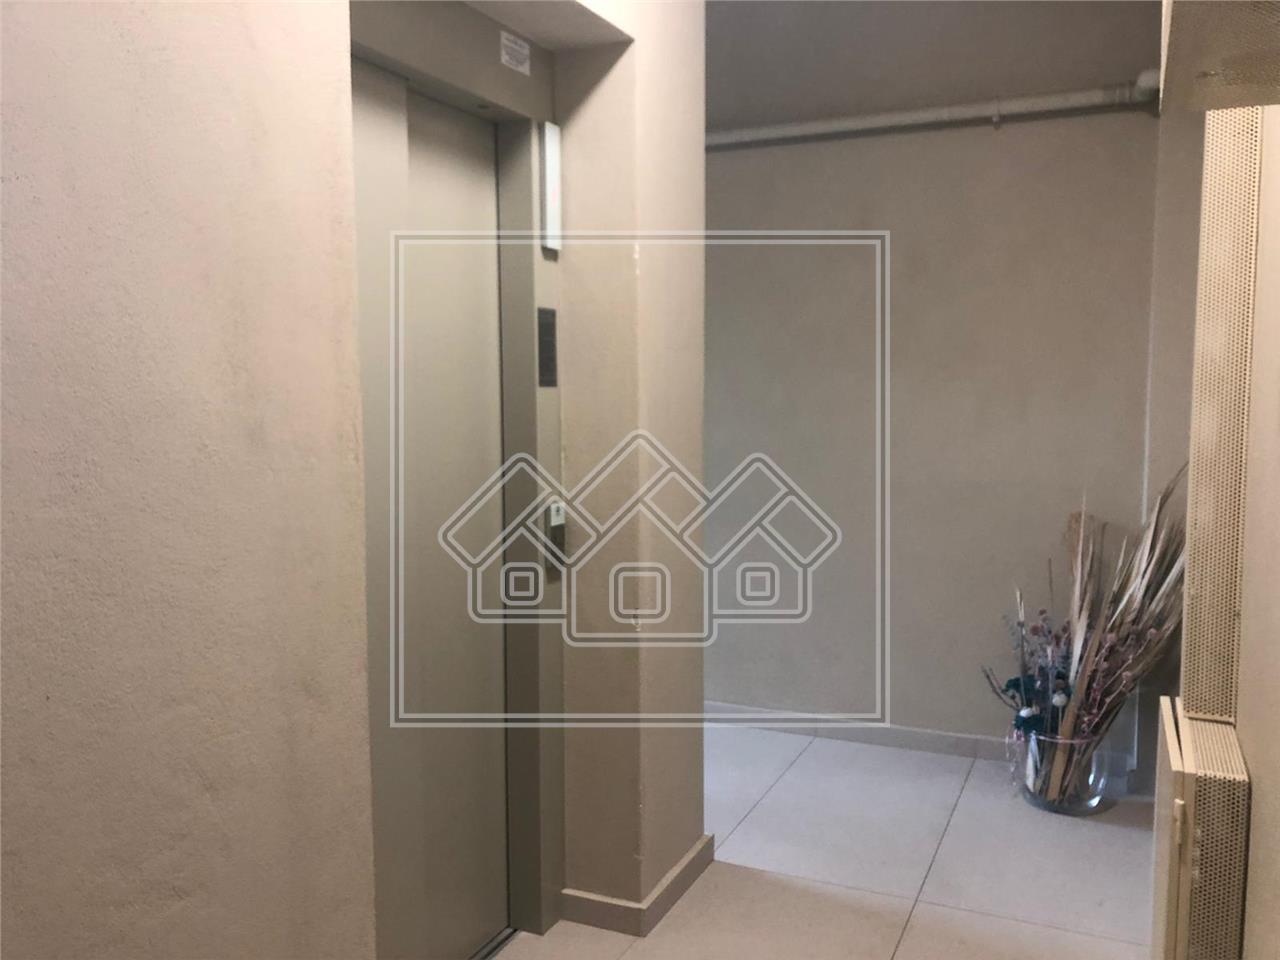 Apartament de inchiriat in Sibiu - Bloc nou cu lift -parcari subterane